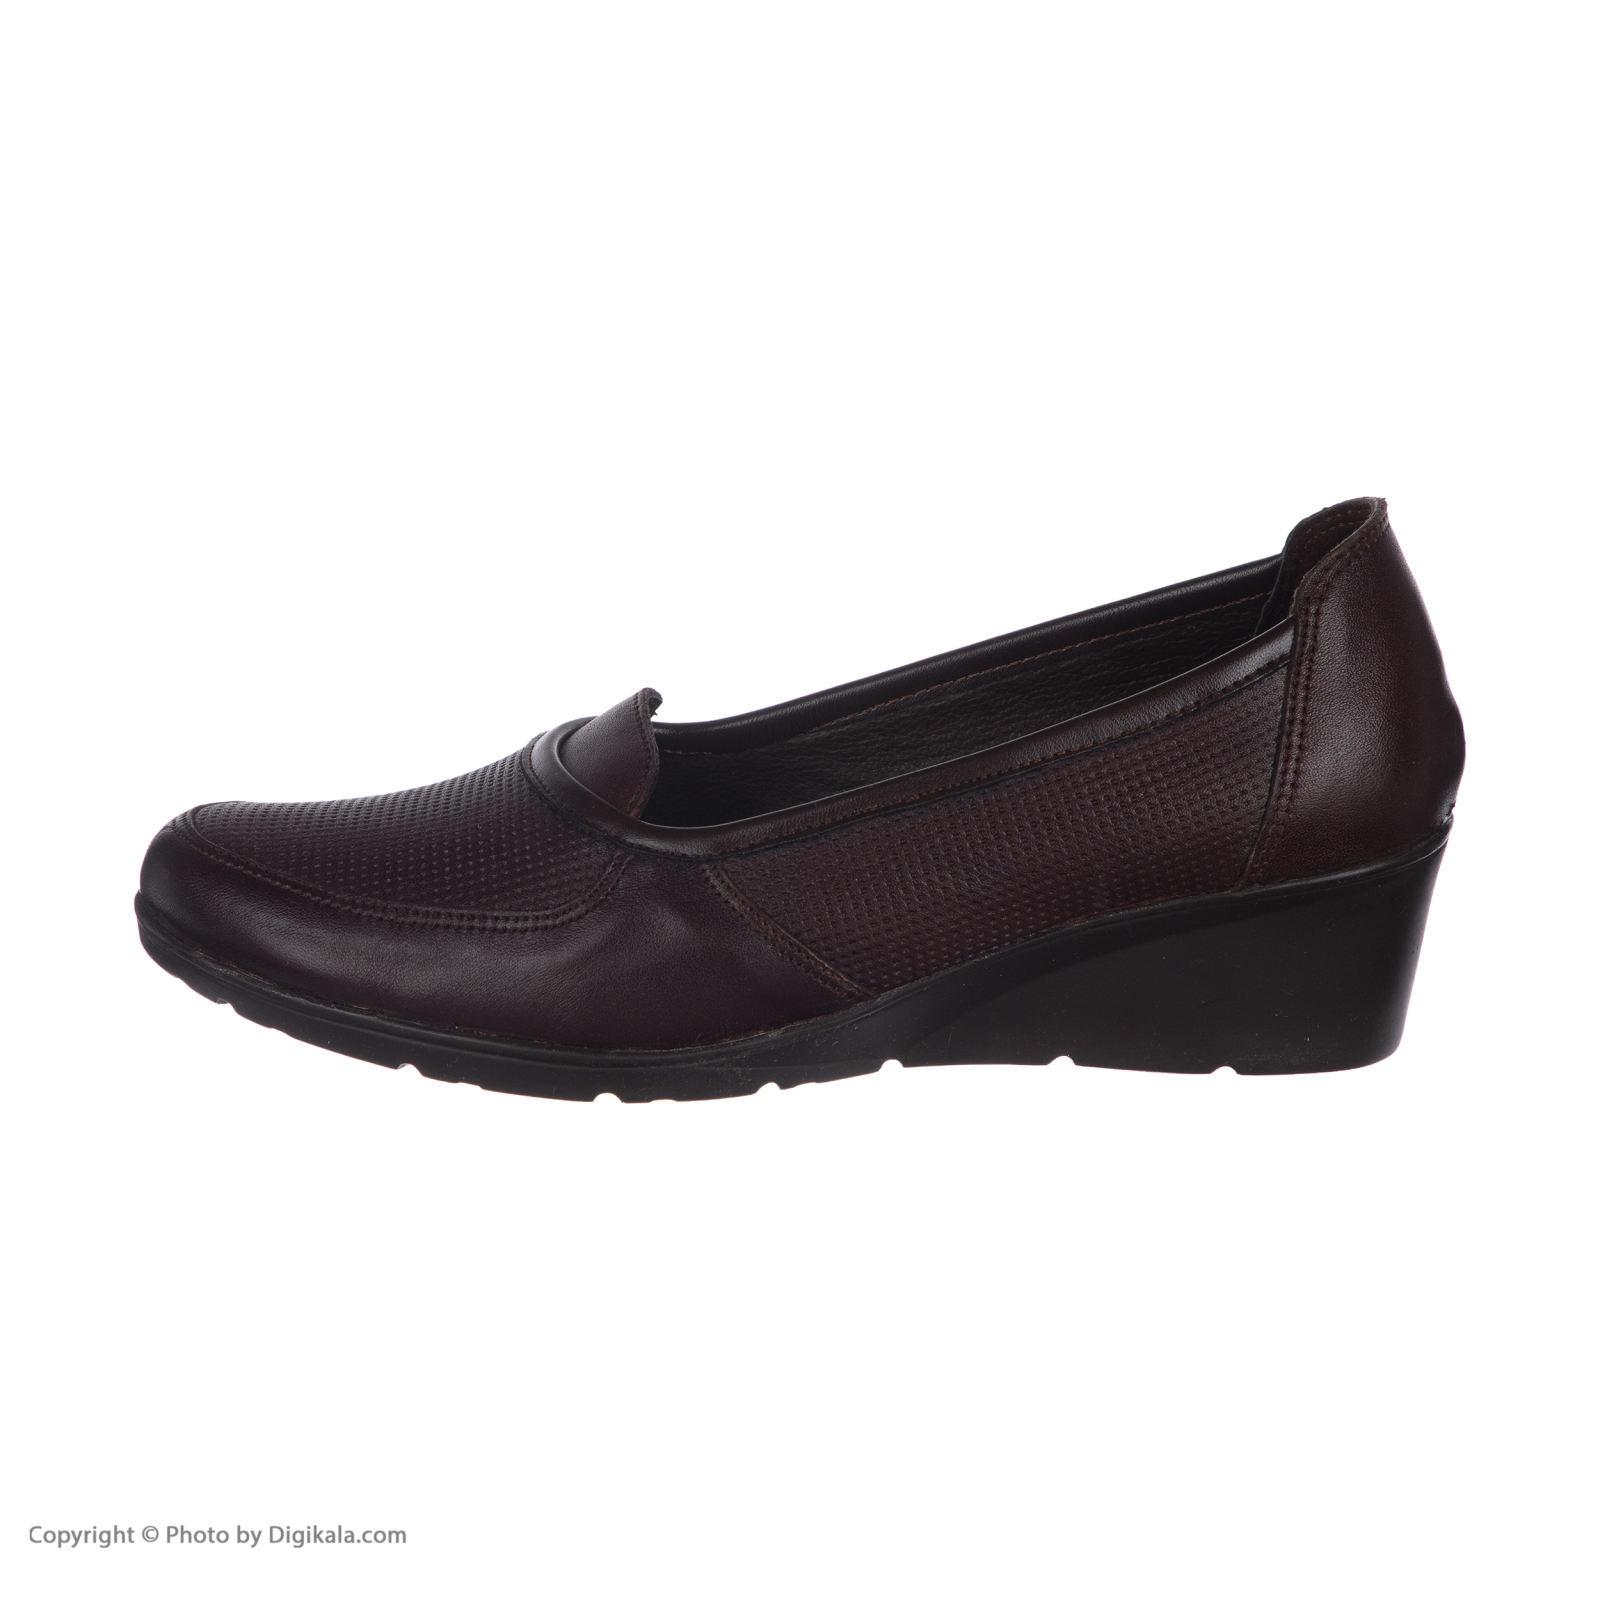 کفش روزمره زنانه دانادل مدل 6602A500104 -  - 1